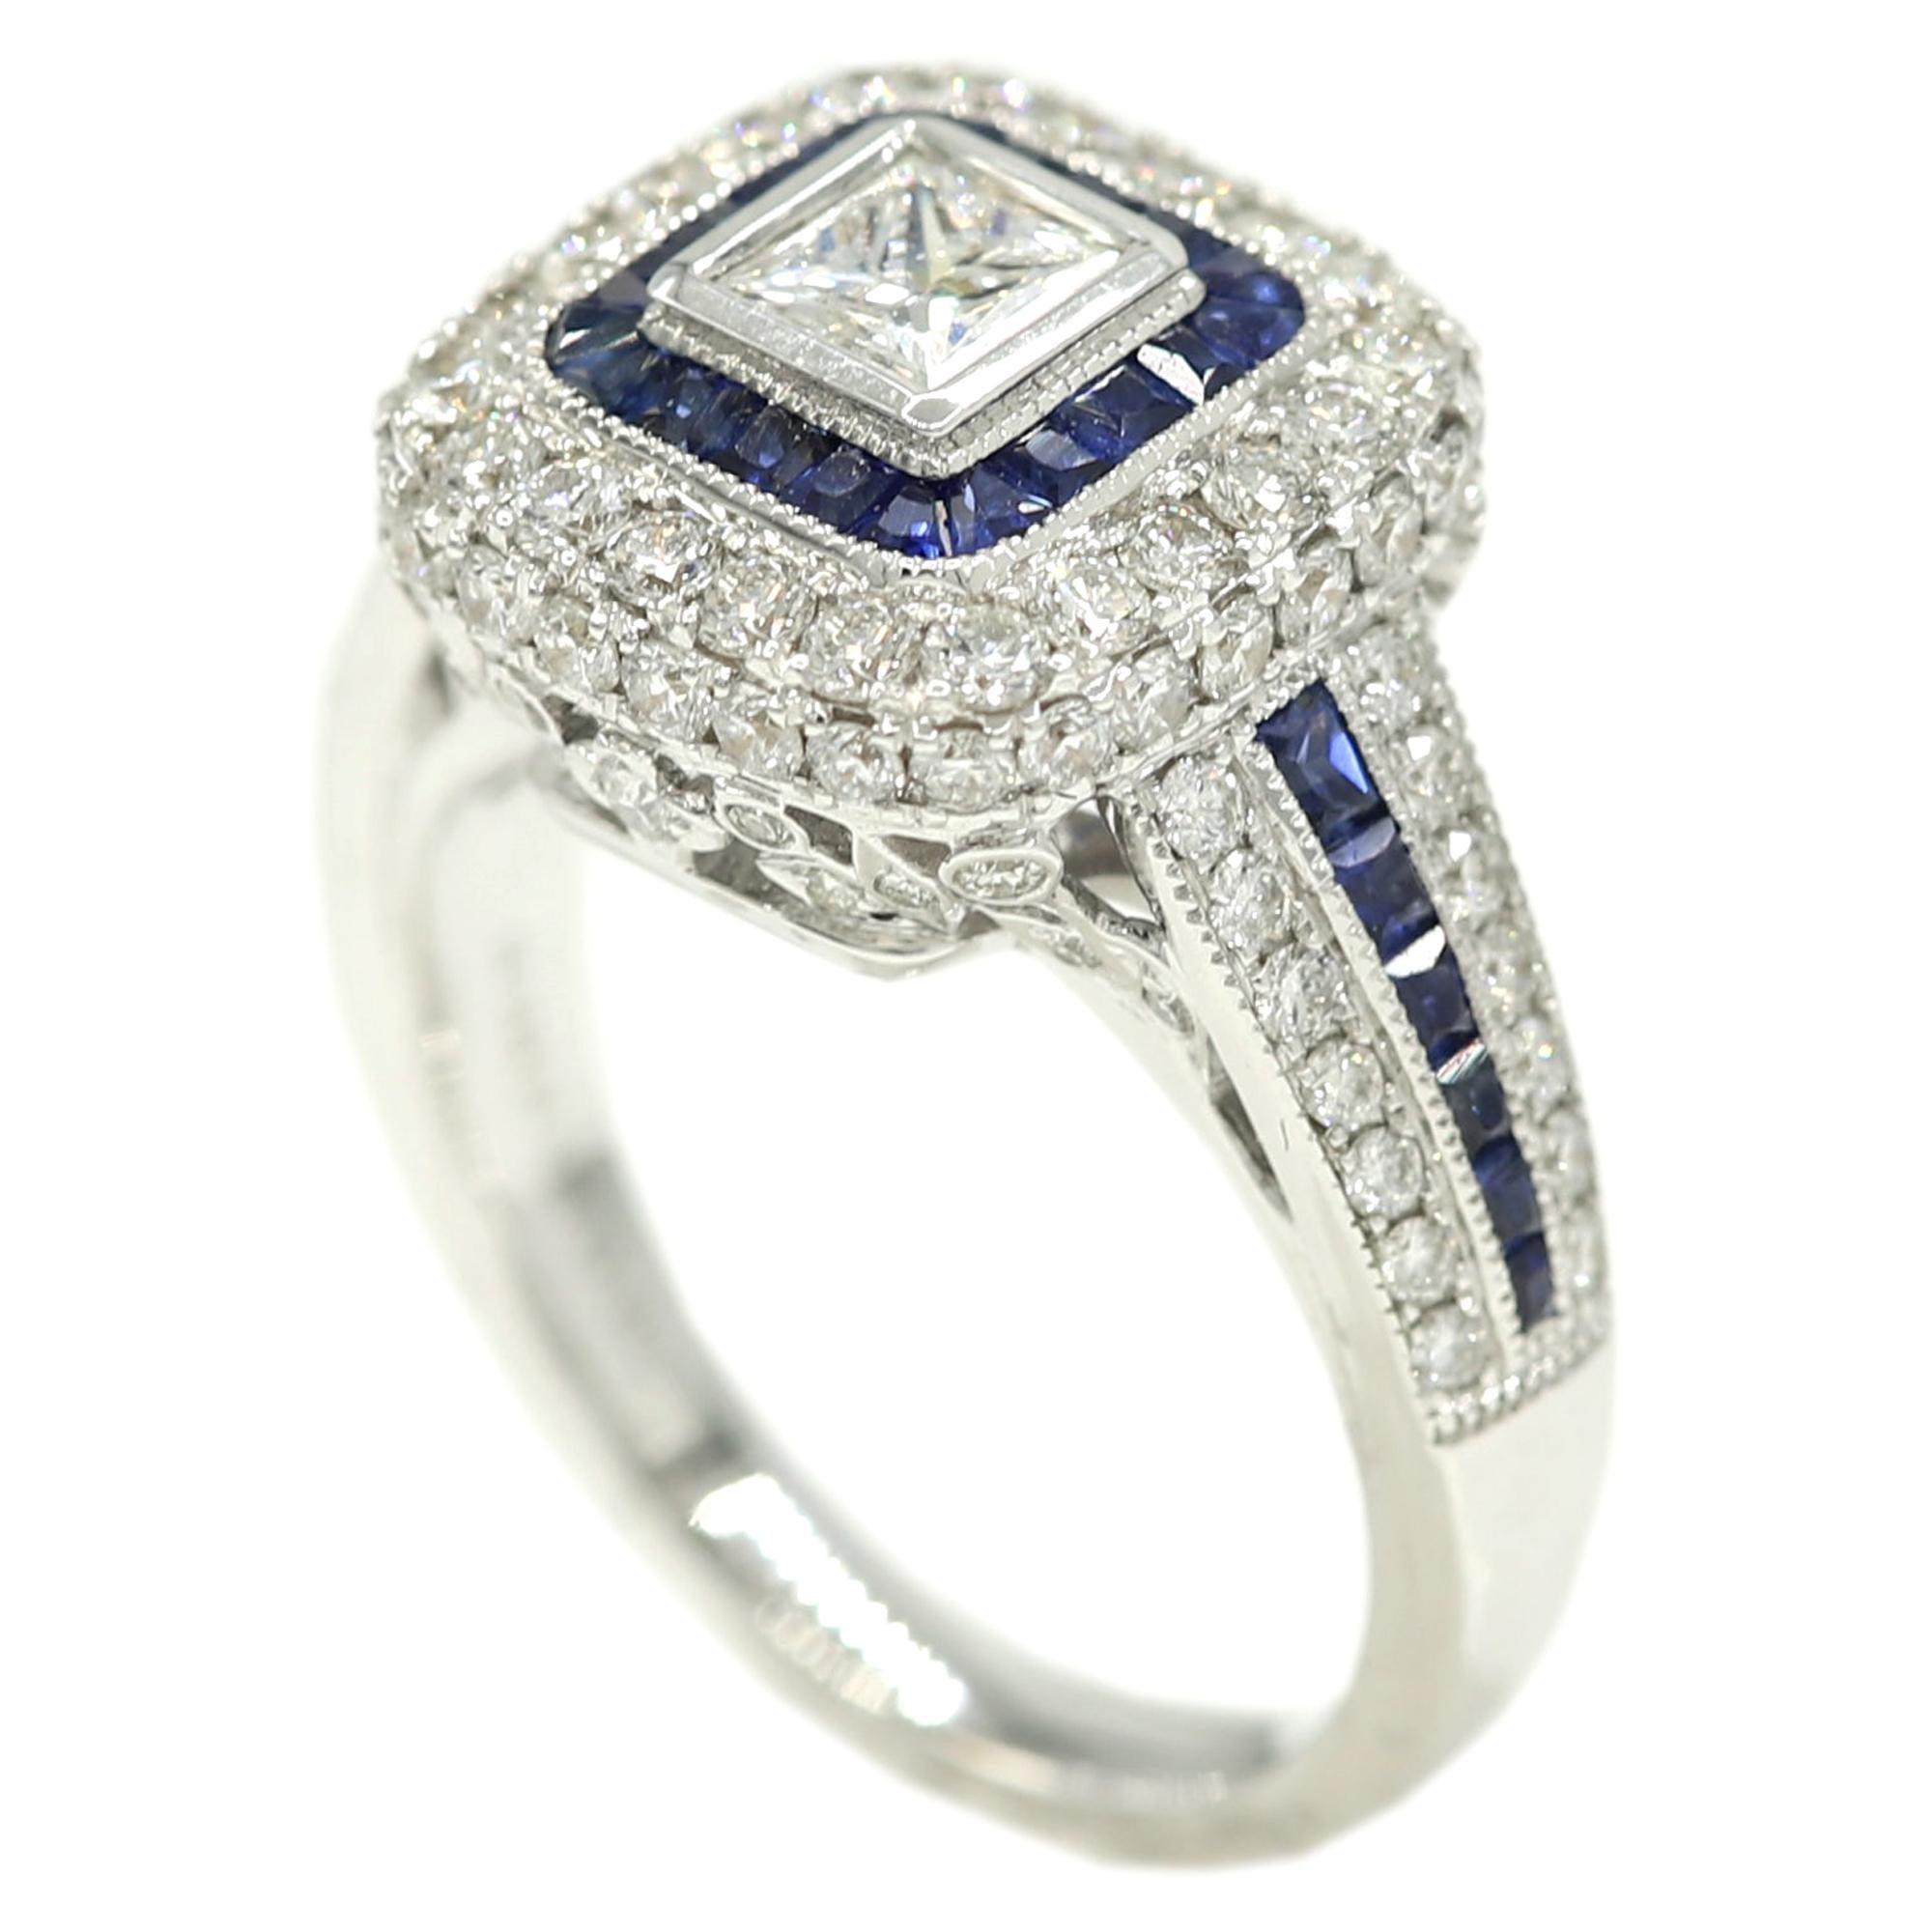 Art Deco Style Ring 18 Karat White Gold, Princess Cut Diamond and Blue Sapphire